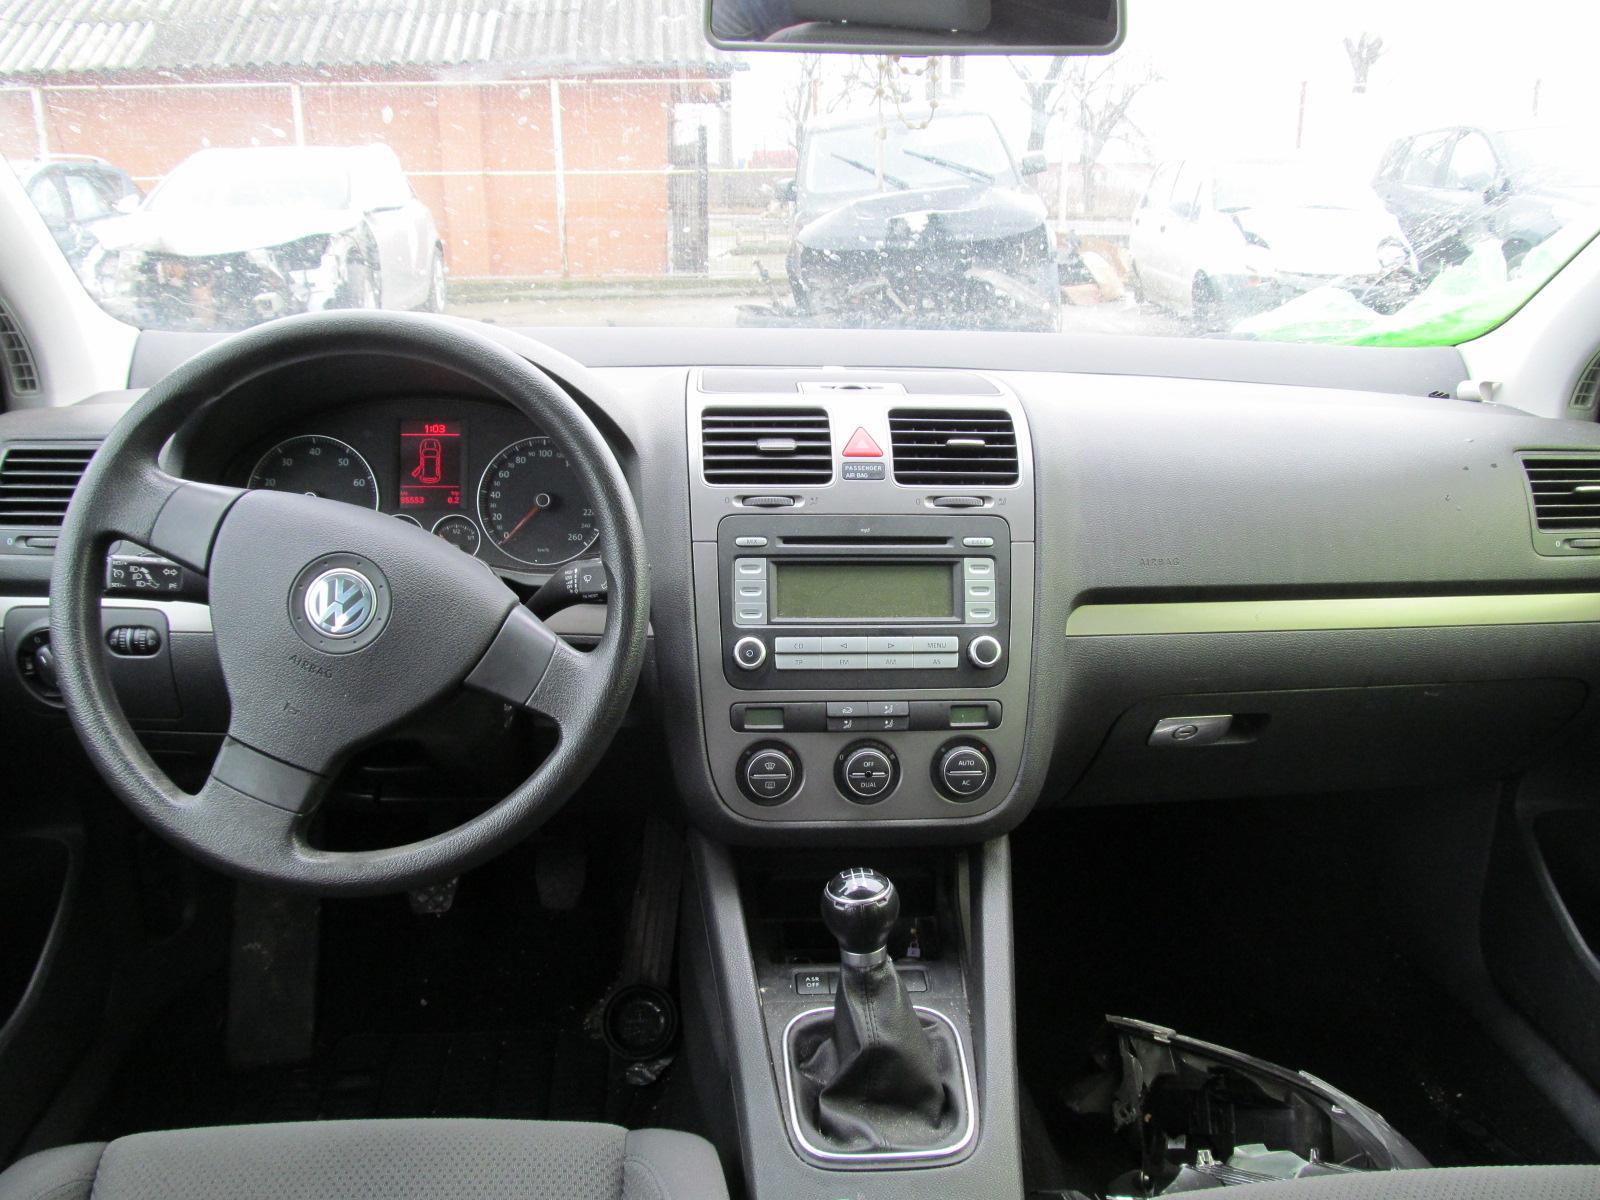 Auto Dezmembrate - Volskwagen Golf 1 6i 2008 Benzina